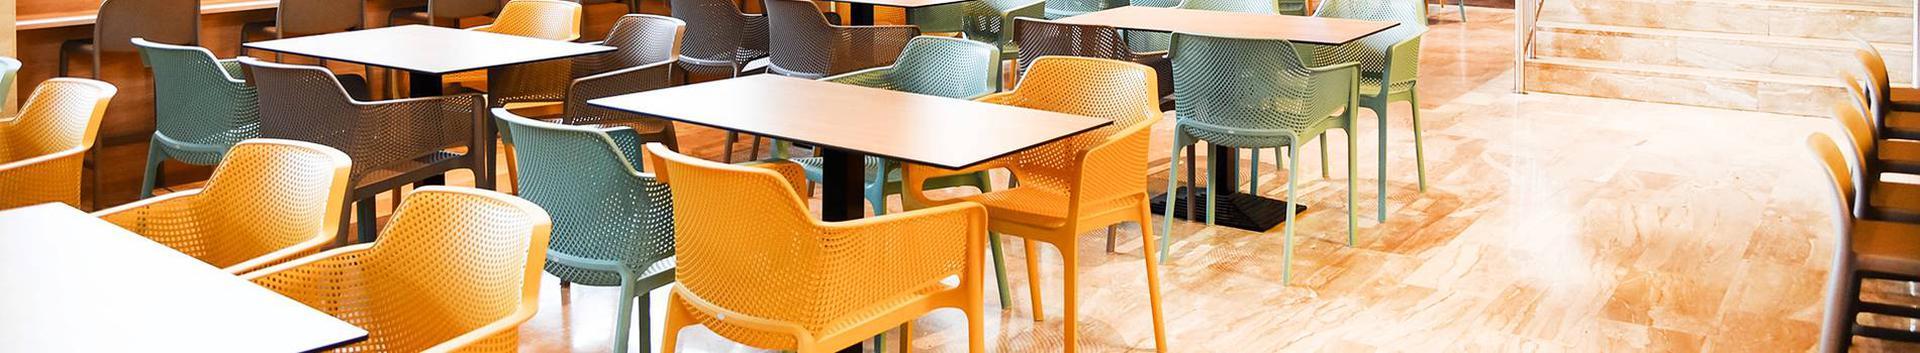 56101_toitlustus-restoran-jm-_54571697_xl.jpg